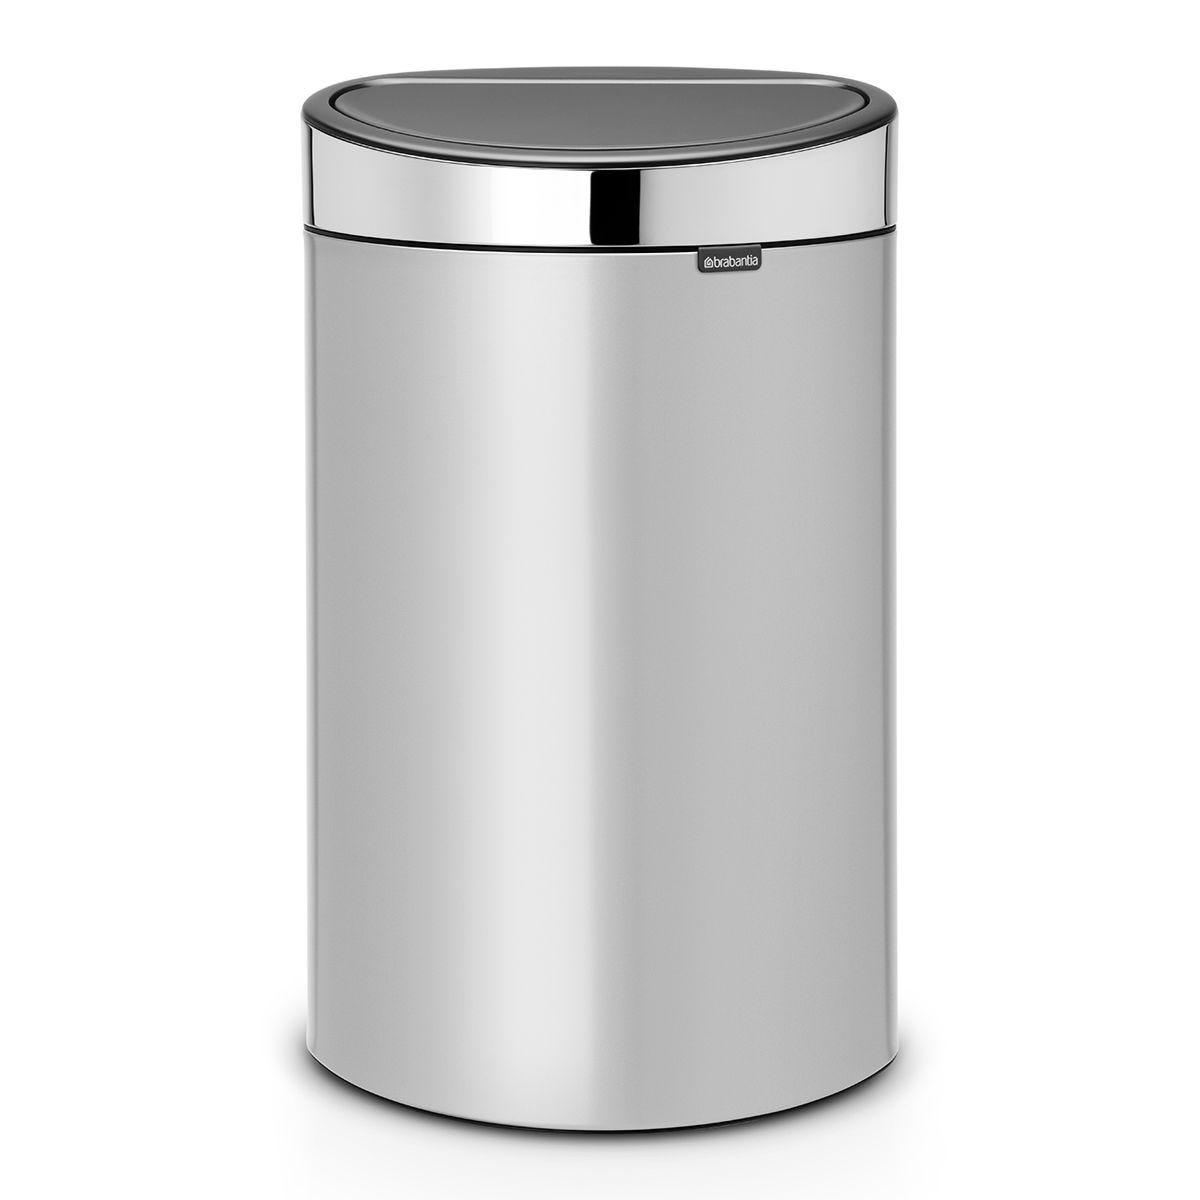 Brabantia 40L Touch Bin - Metallic Grey